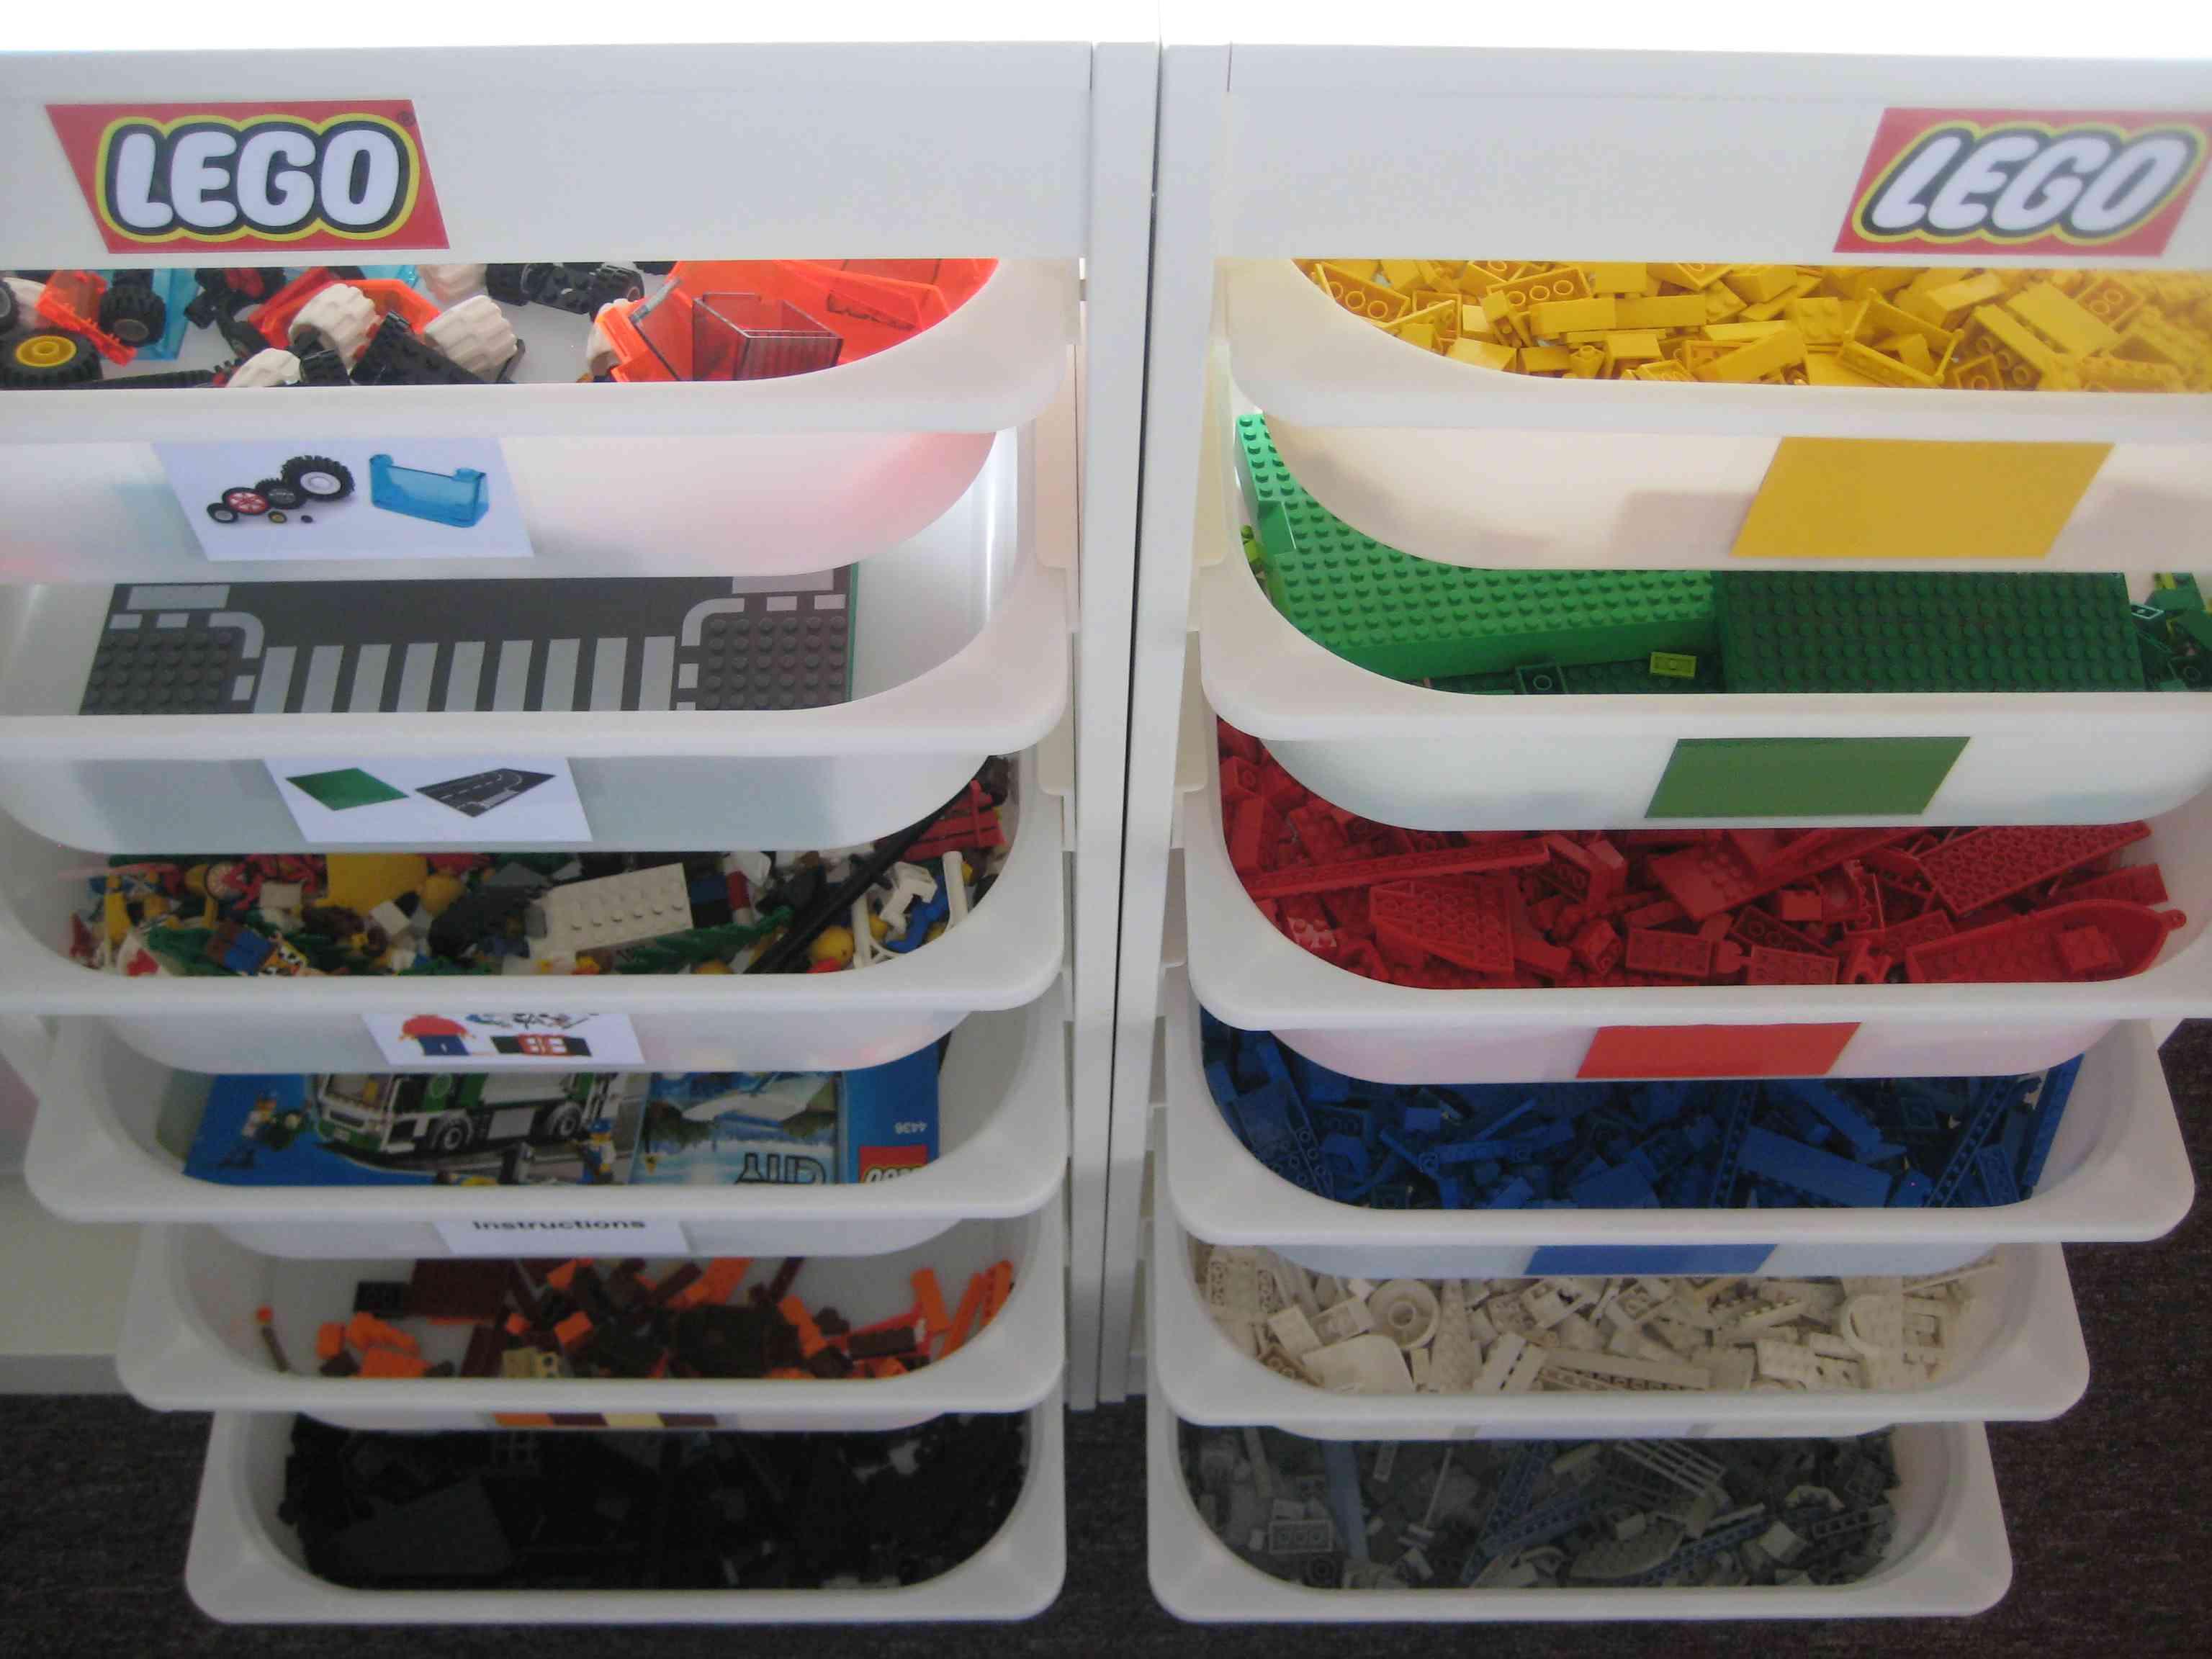 LEGOs in plastic bins organized by color